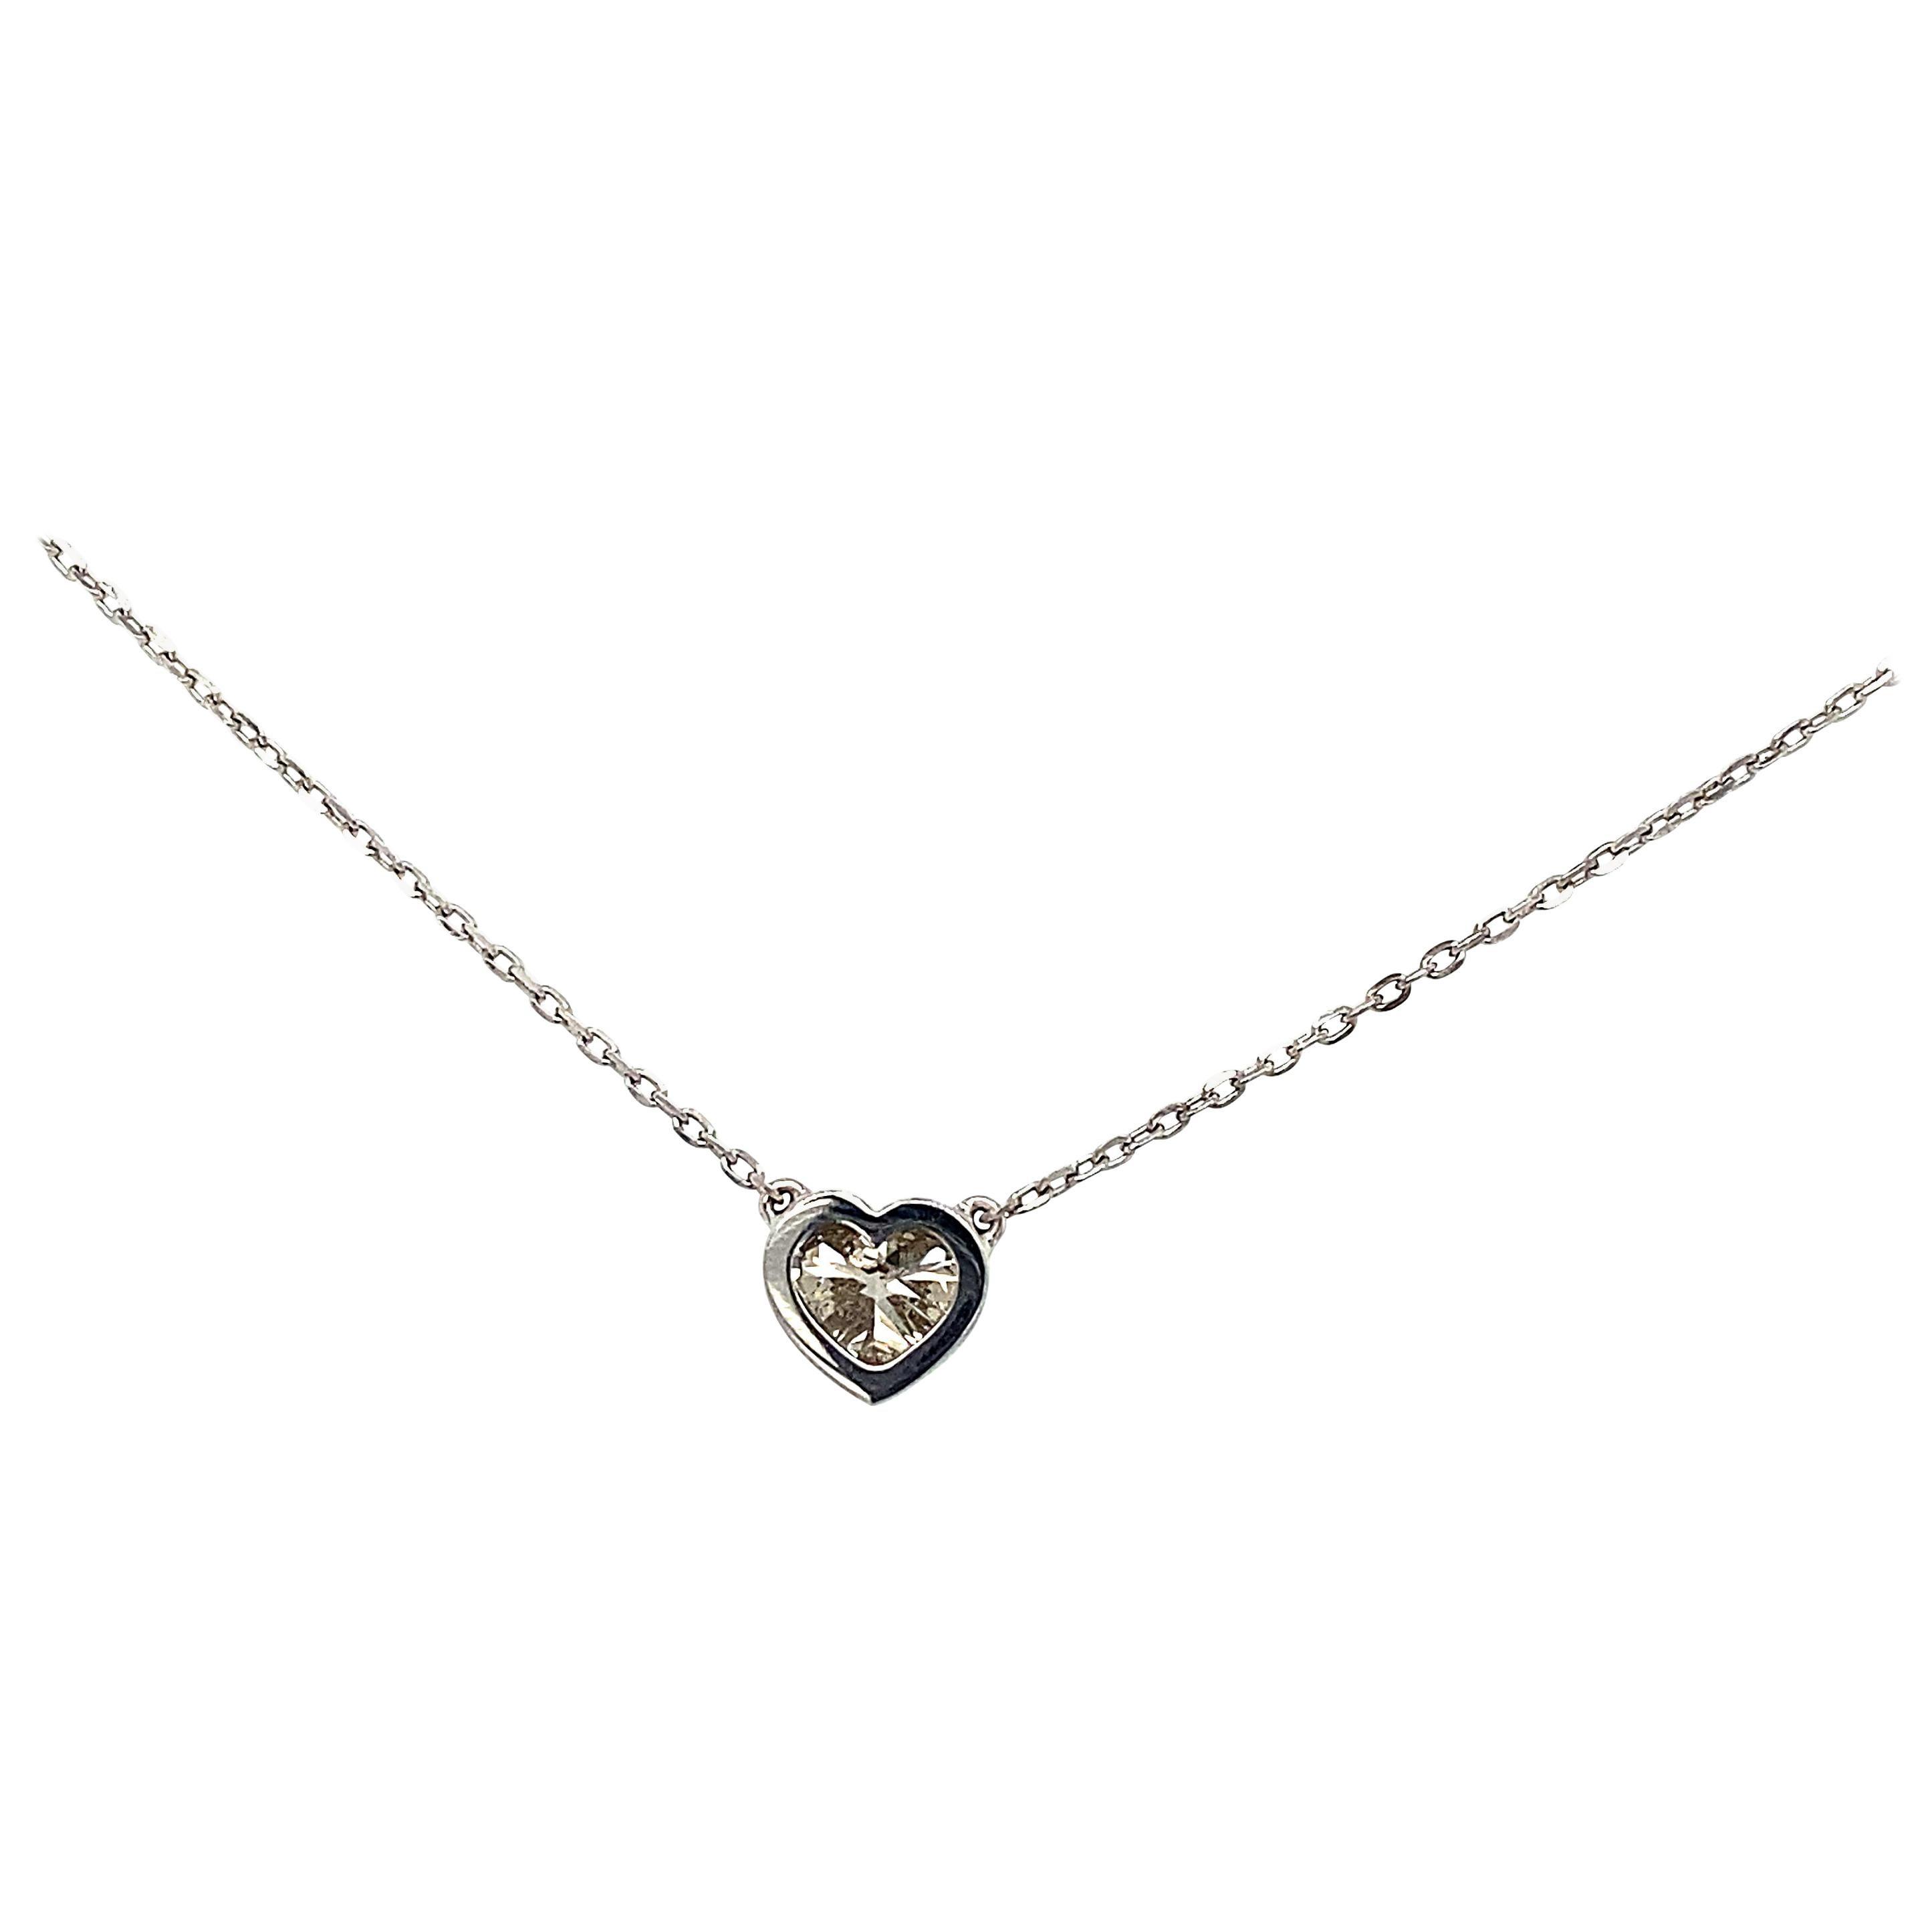 0.72 Carat GIA Heart Shaped Diamond 18 Carat White Gold Necklace